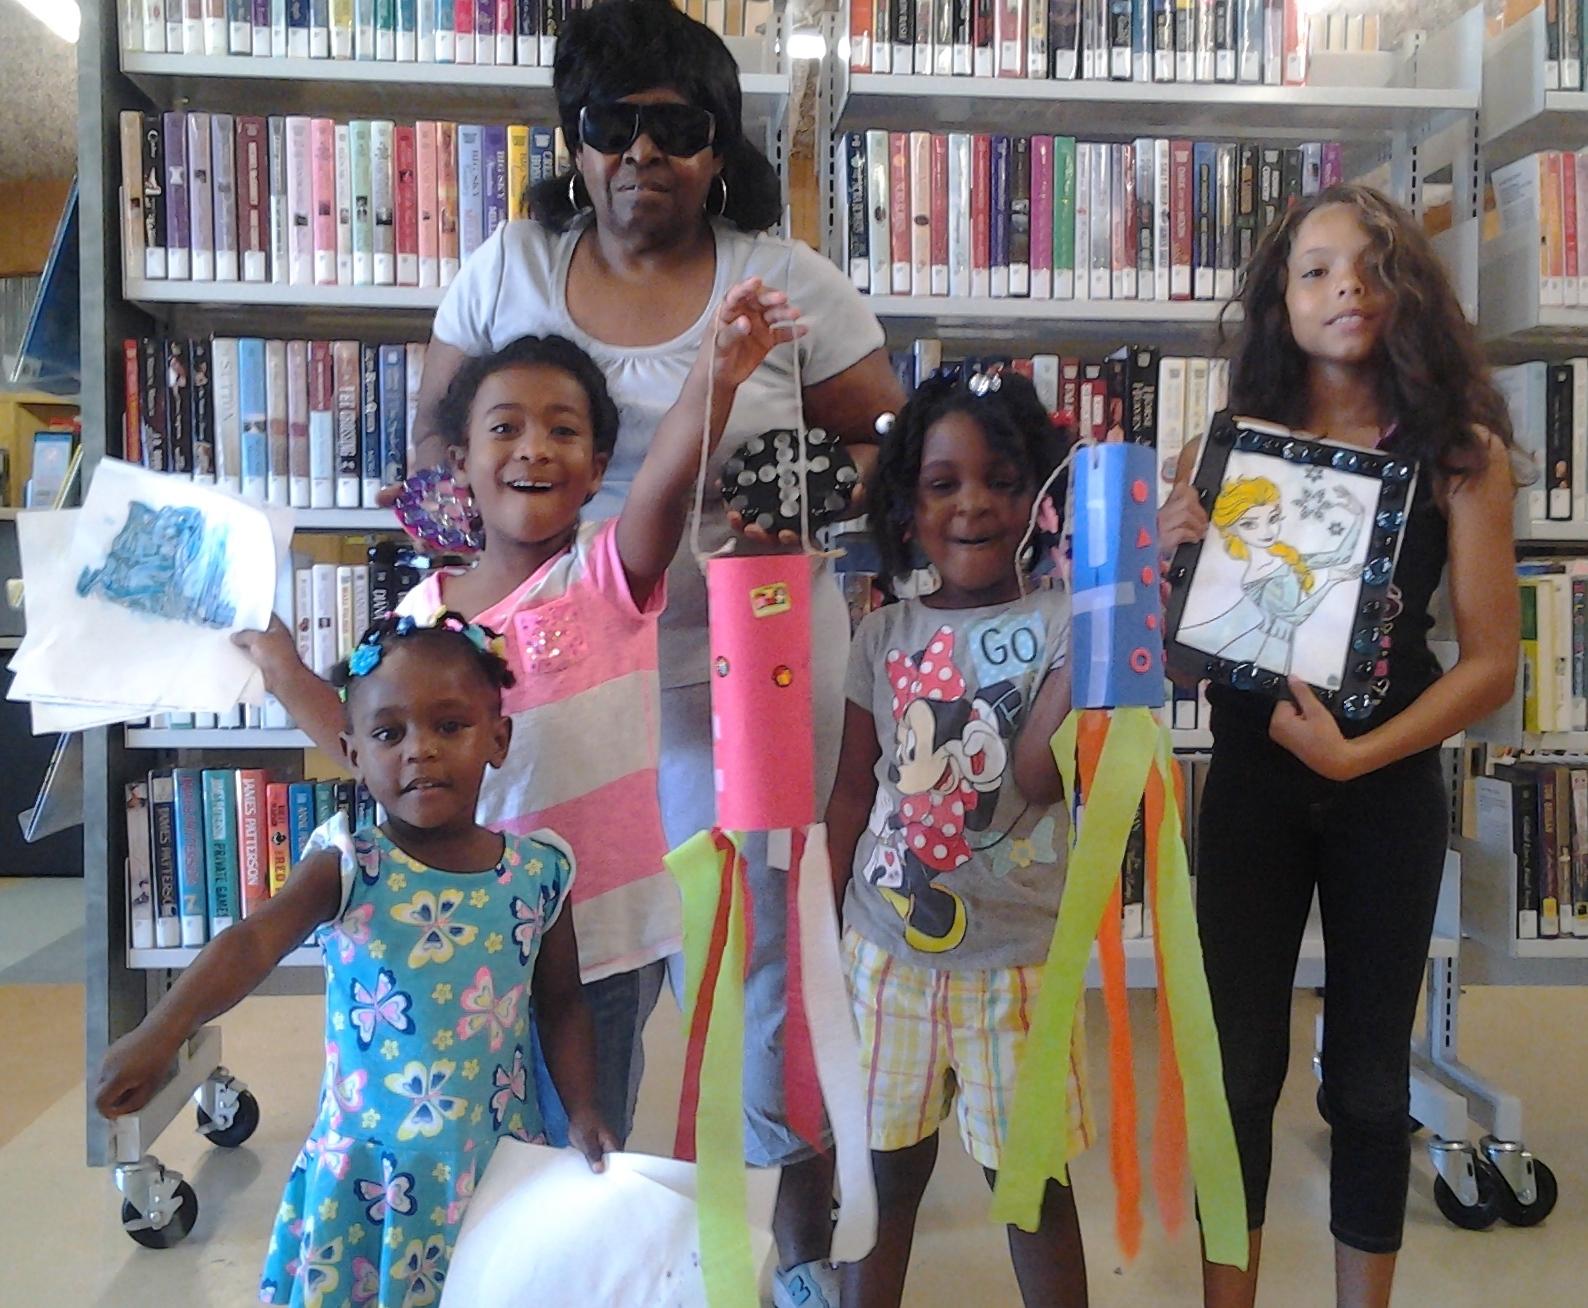 Cam_grandma with grandchildren